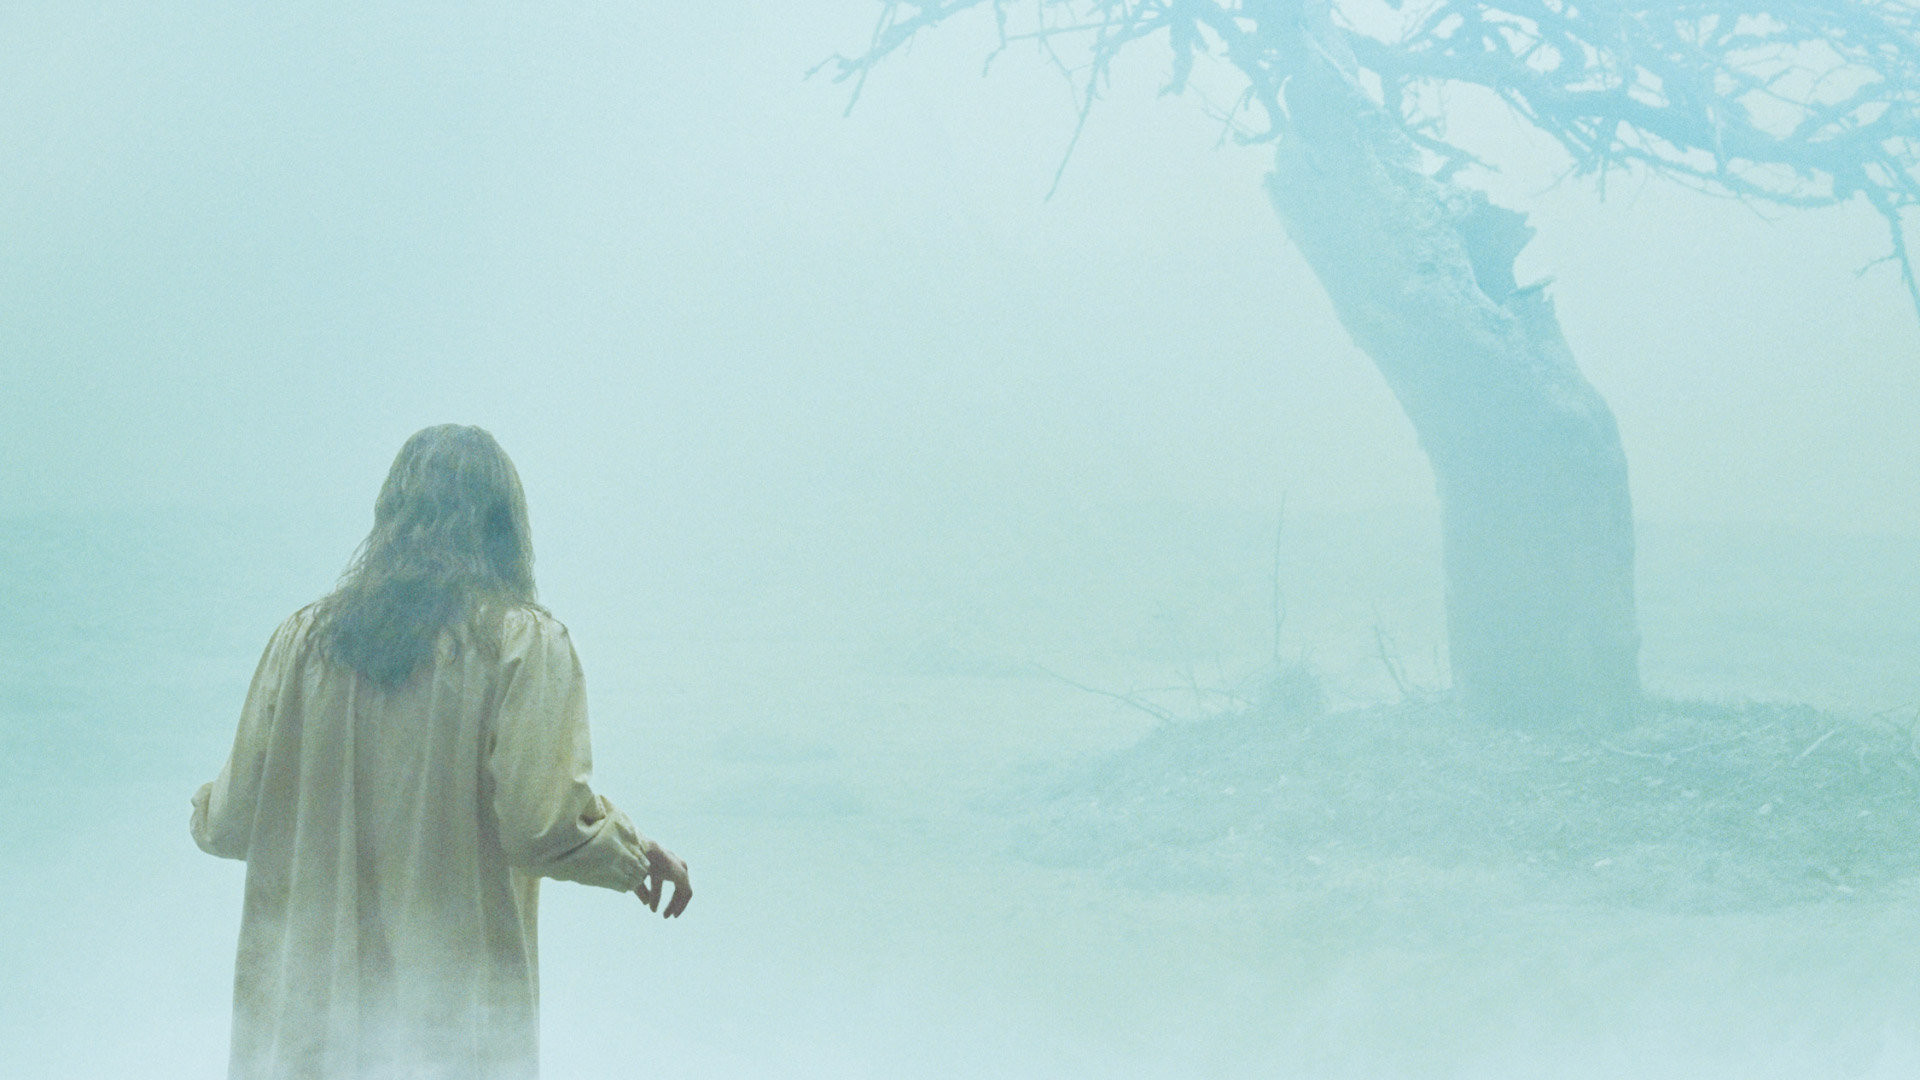 The exorcism of emily rose full movie dailymotion - Online